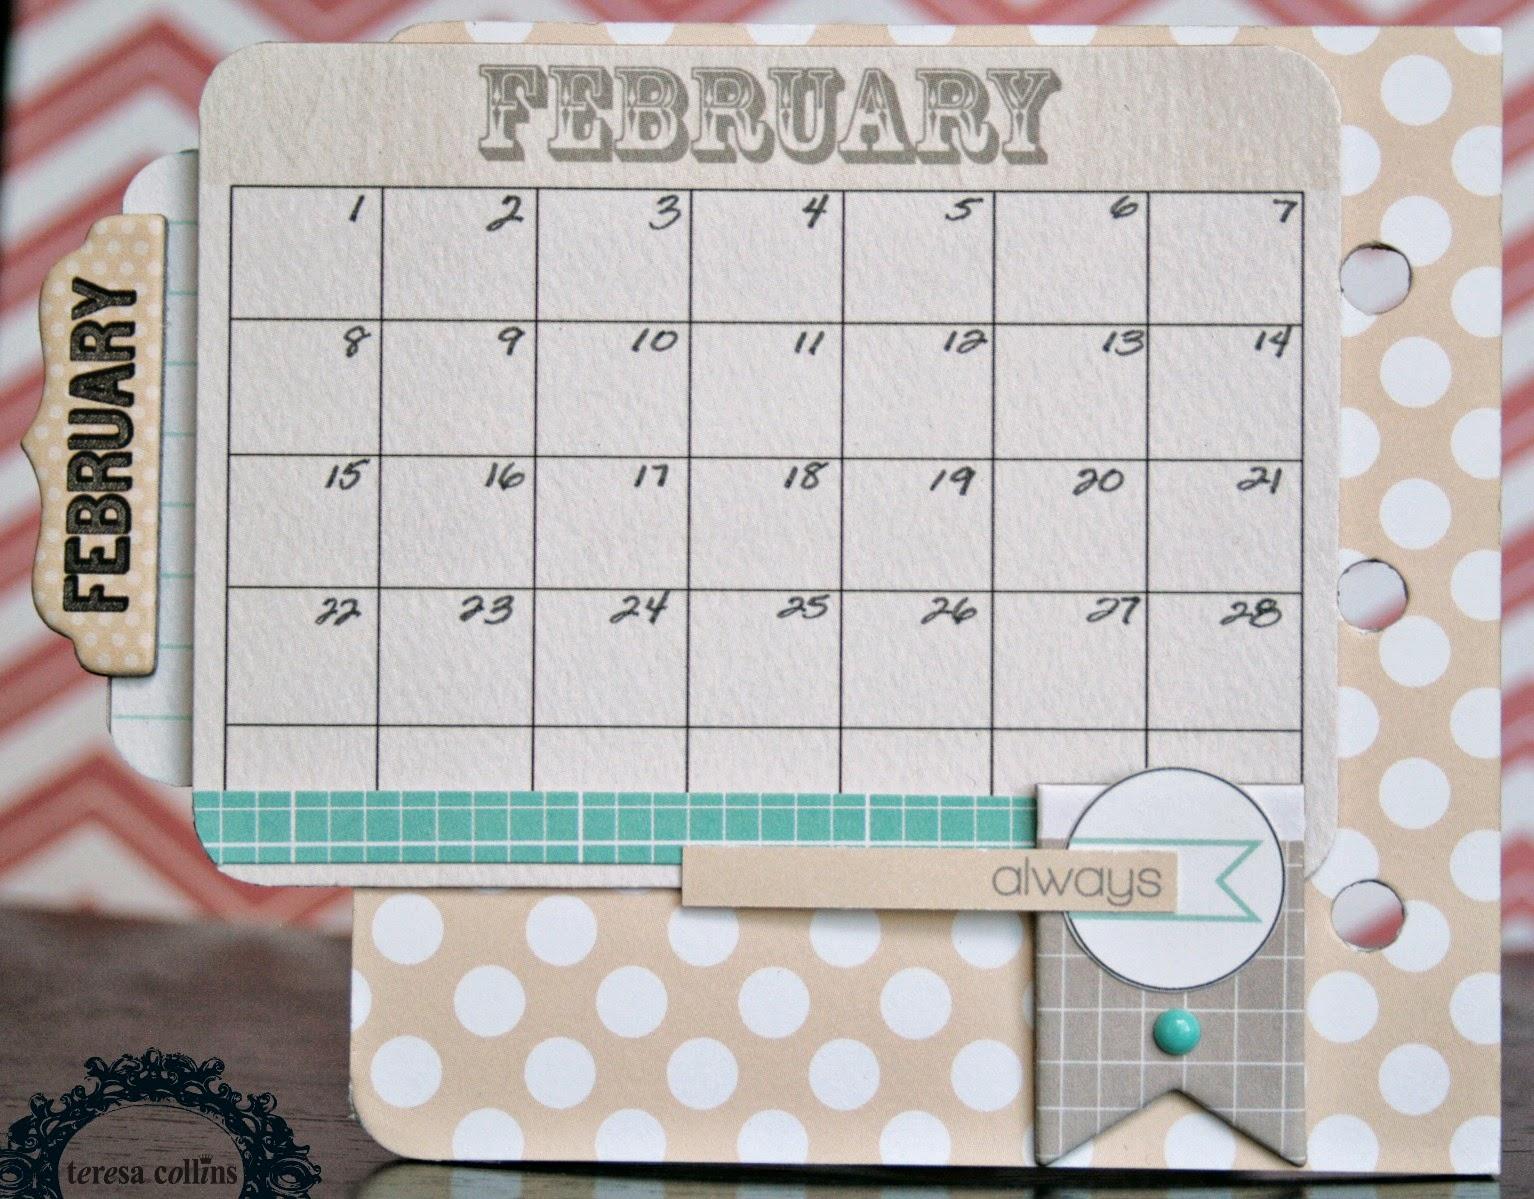 Calendar Design Tutorial : Teresa collins design team calendar mini album tutorial